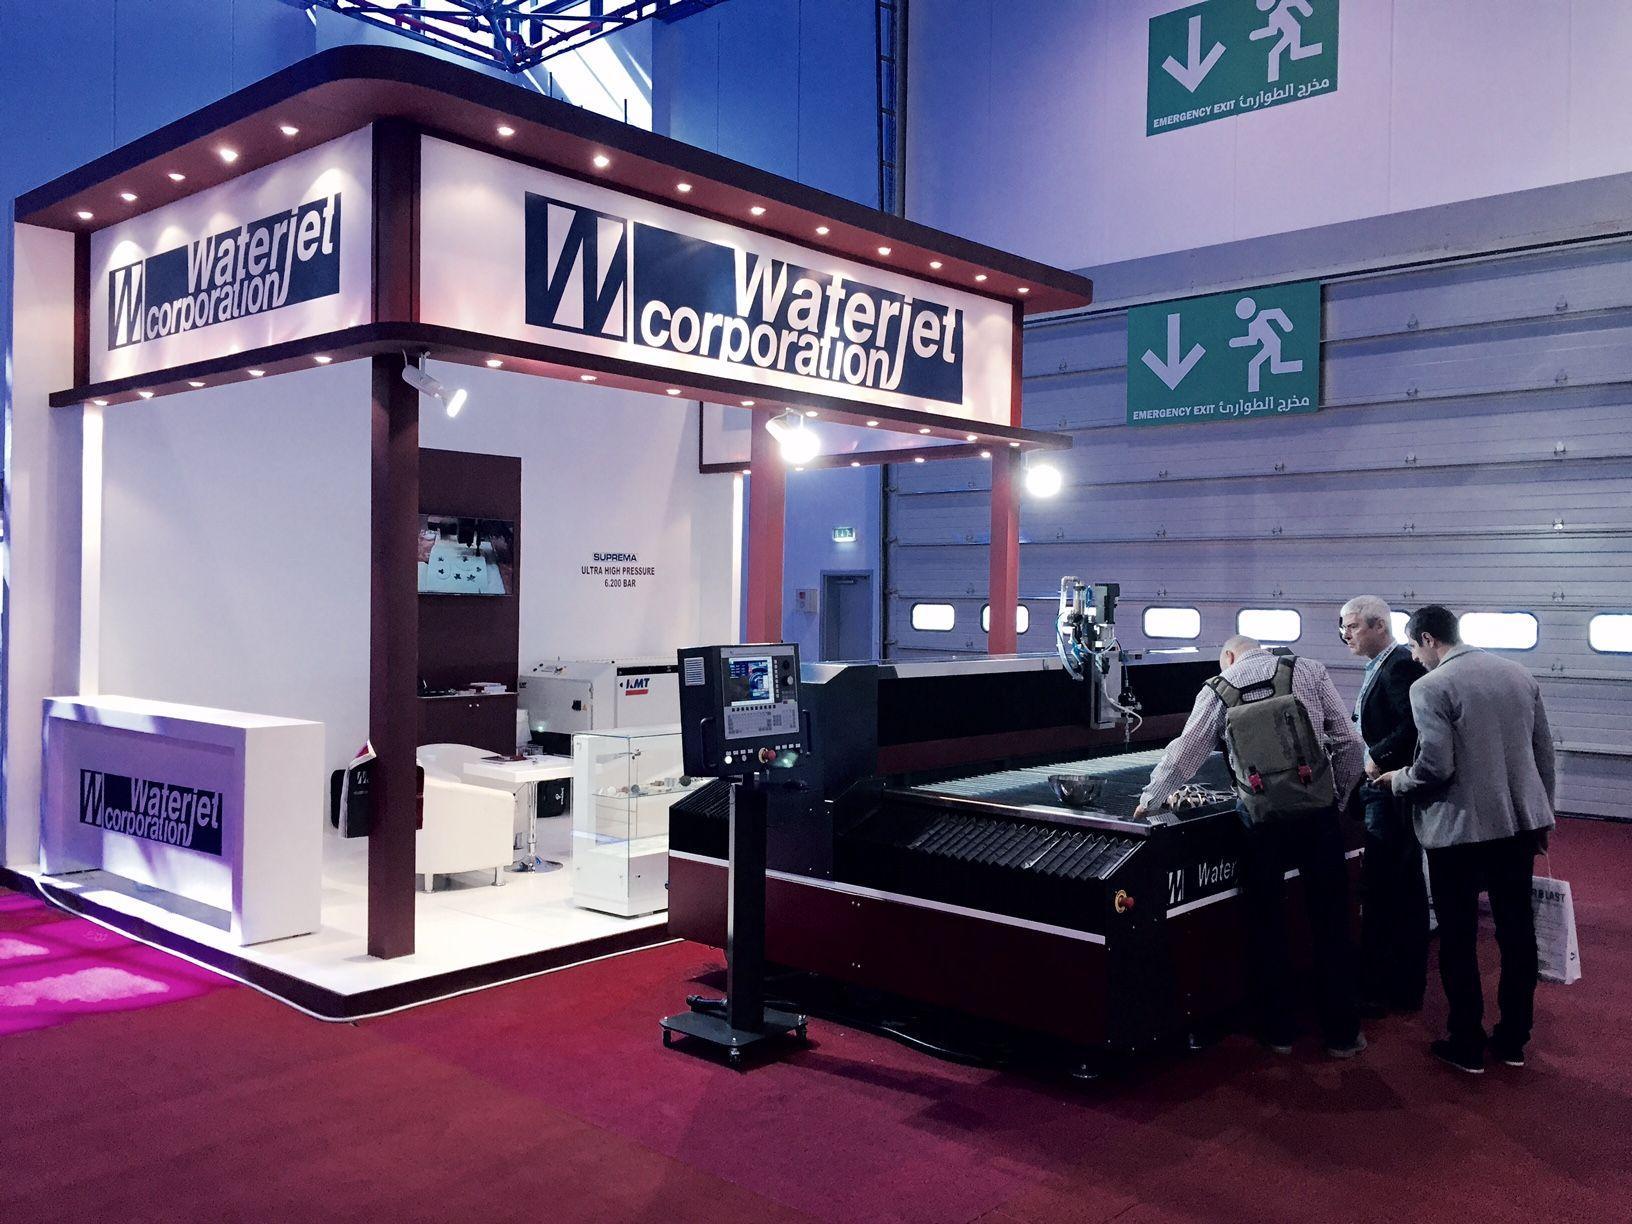 Waterjet Machine Suprema DX 510 at Steel Fab Show 2015 Sharjah UAE